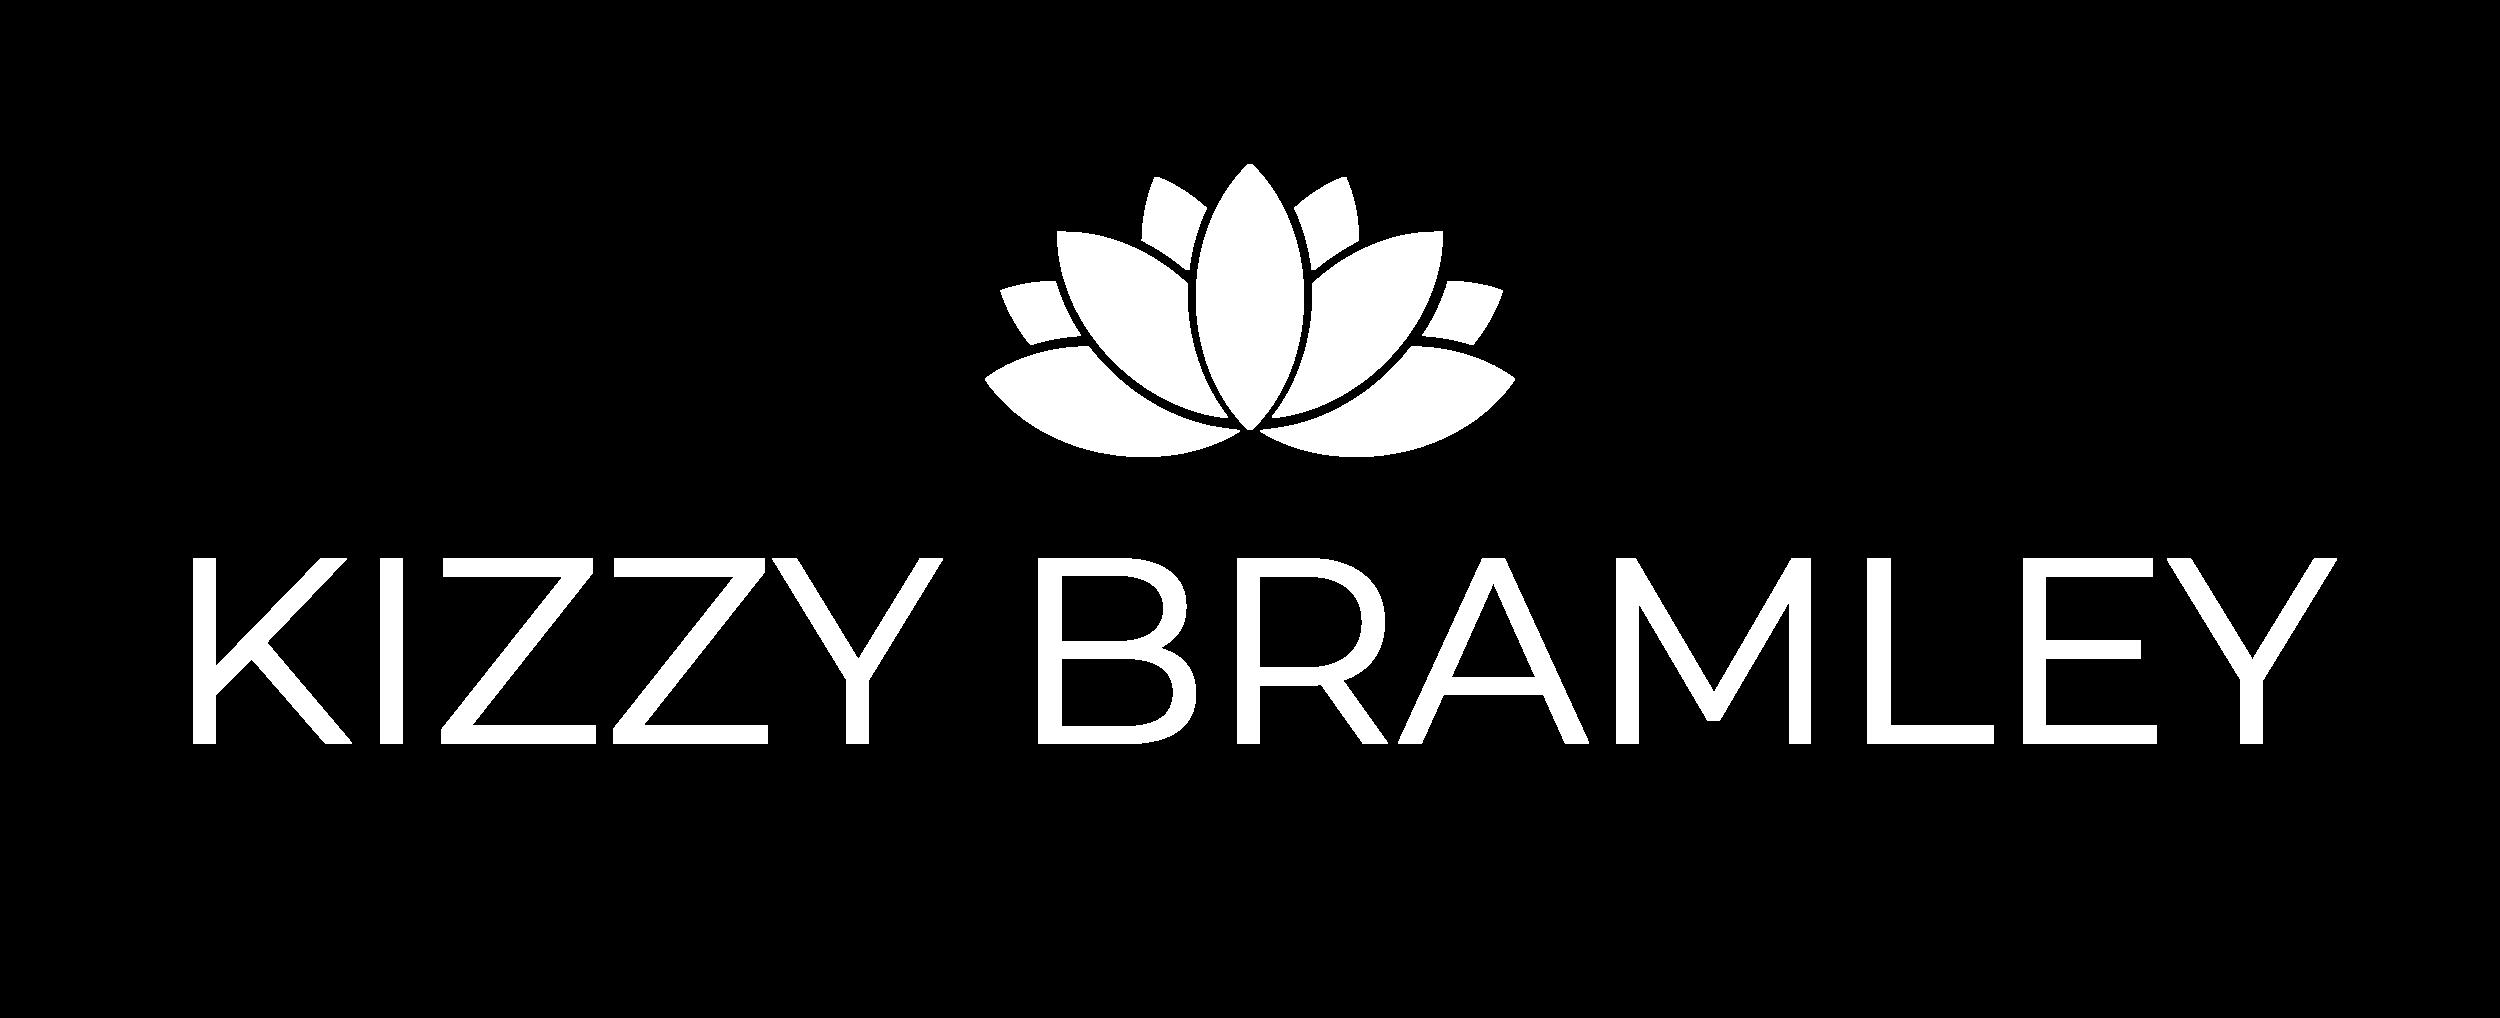 KIZZY BRAMLEY-logo-white (1).png